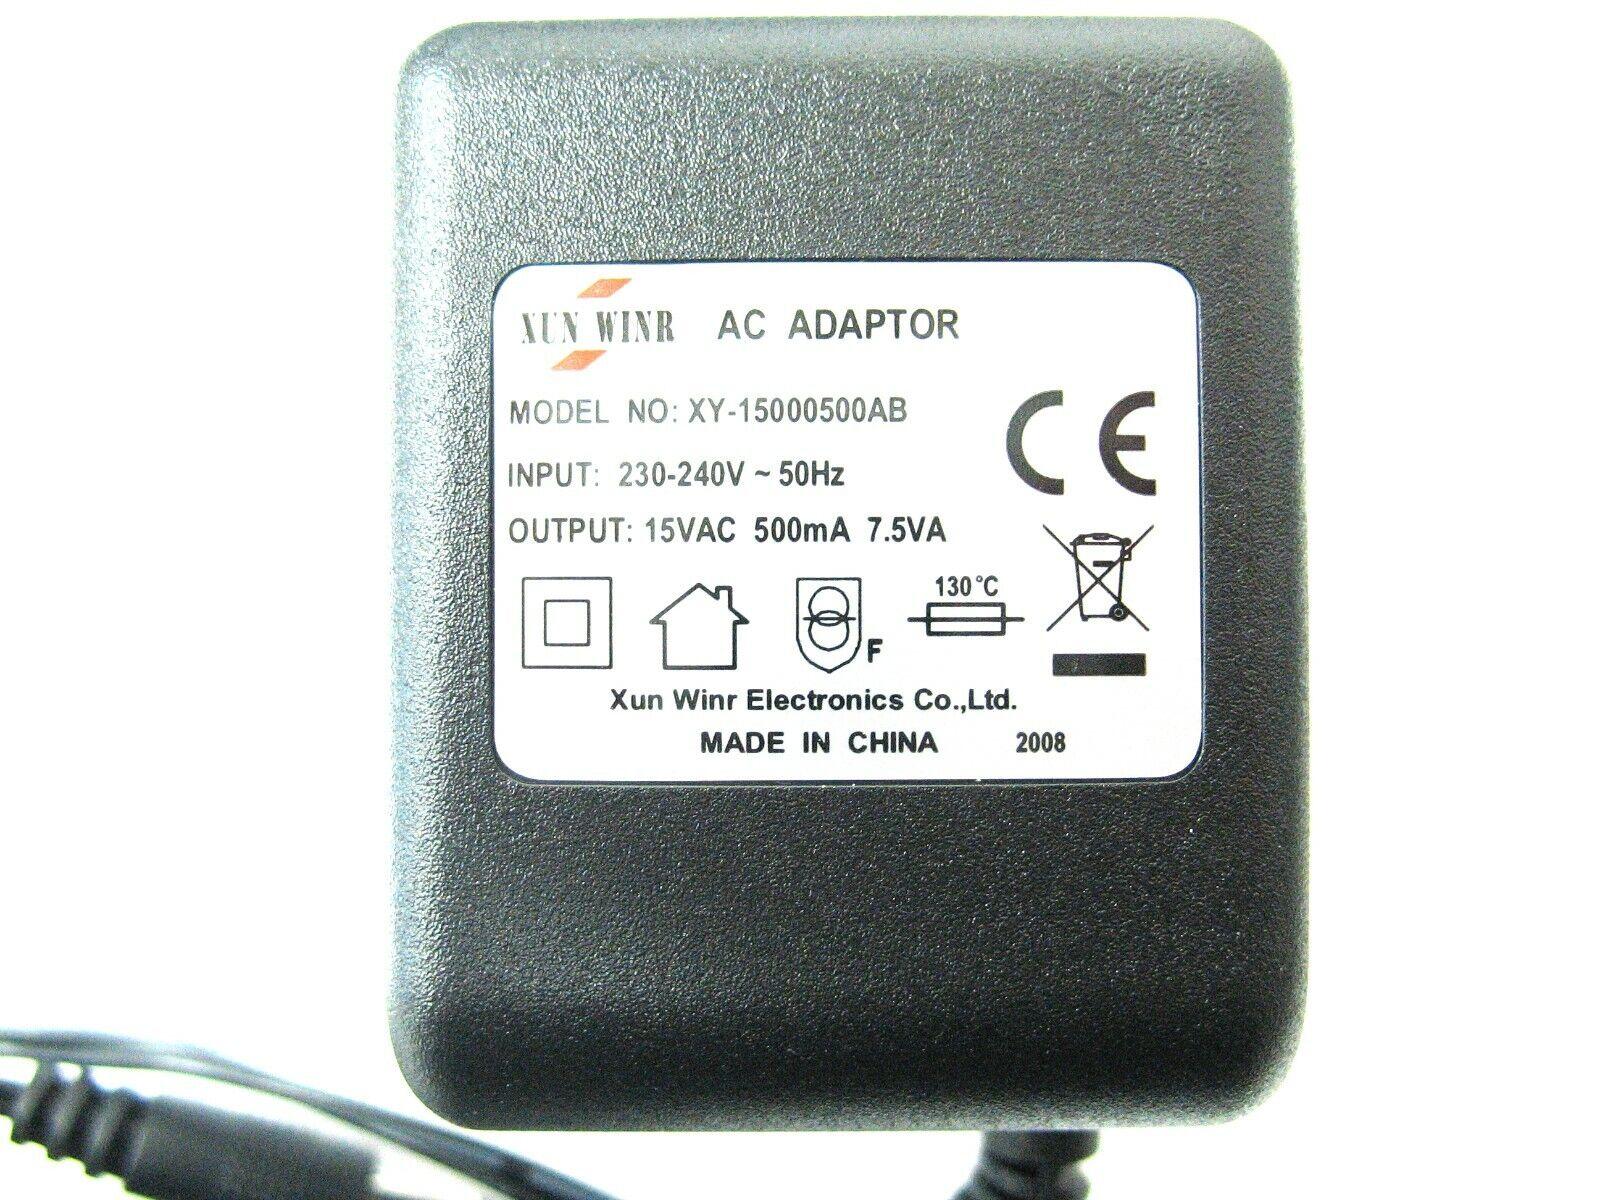 500ma 15v AC-AC (AC Output) Mains Power Adaptor/Supply/Charger 0.5a, 7.5w, 7.5va